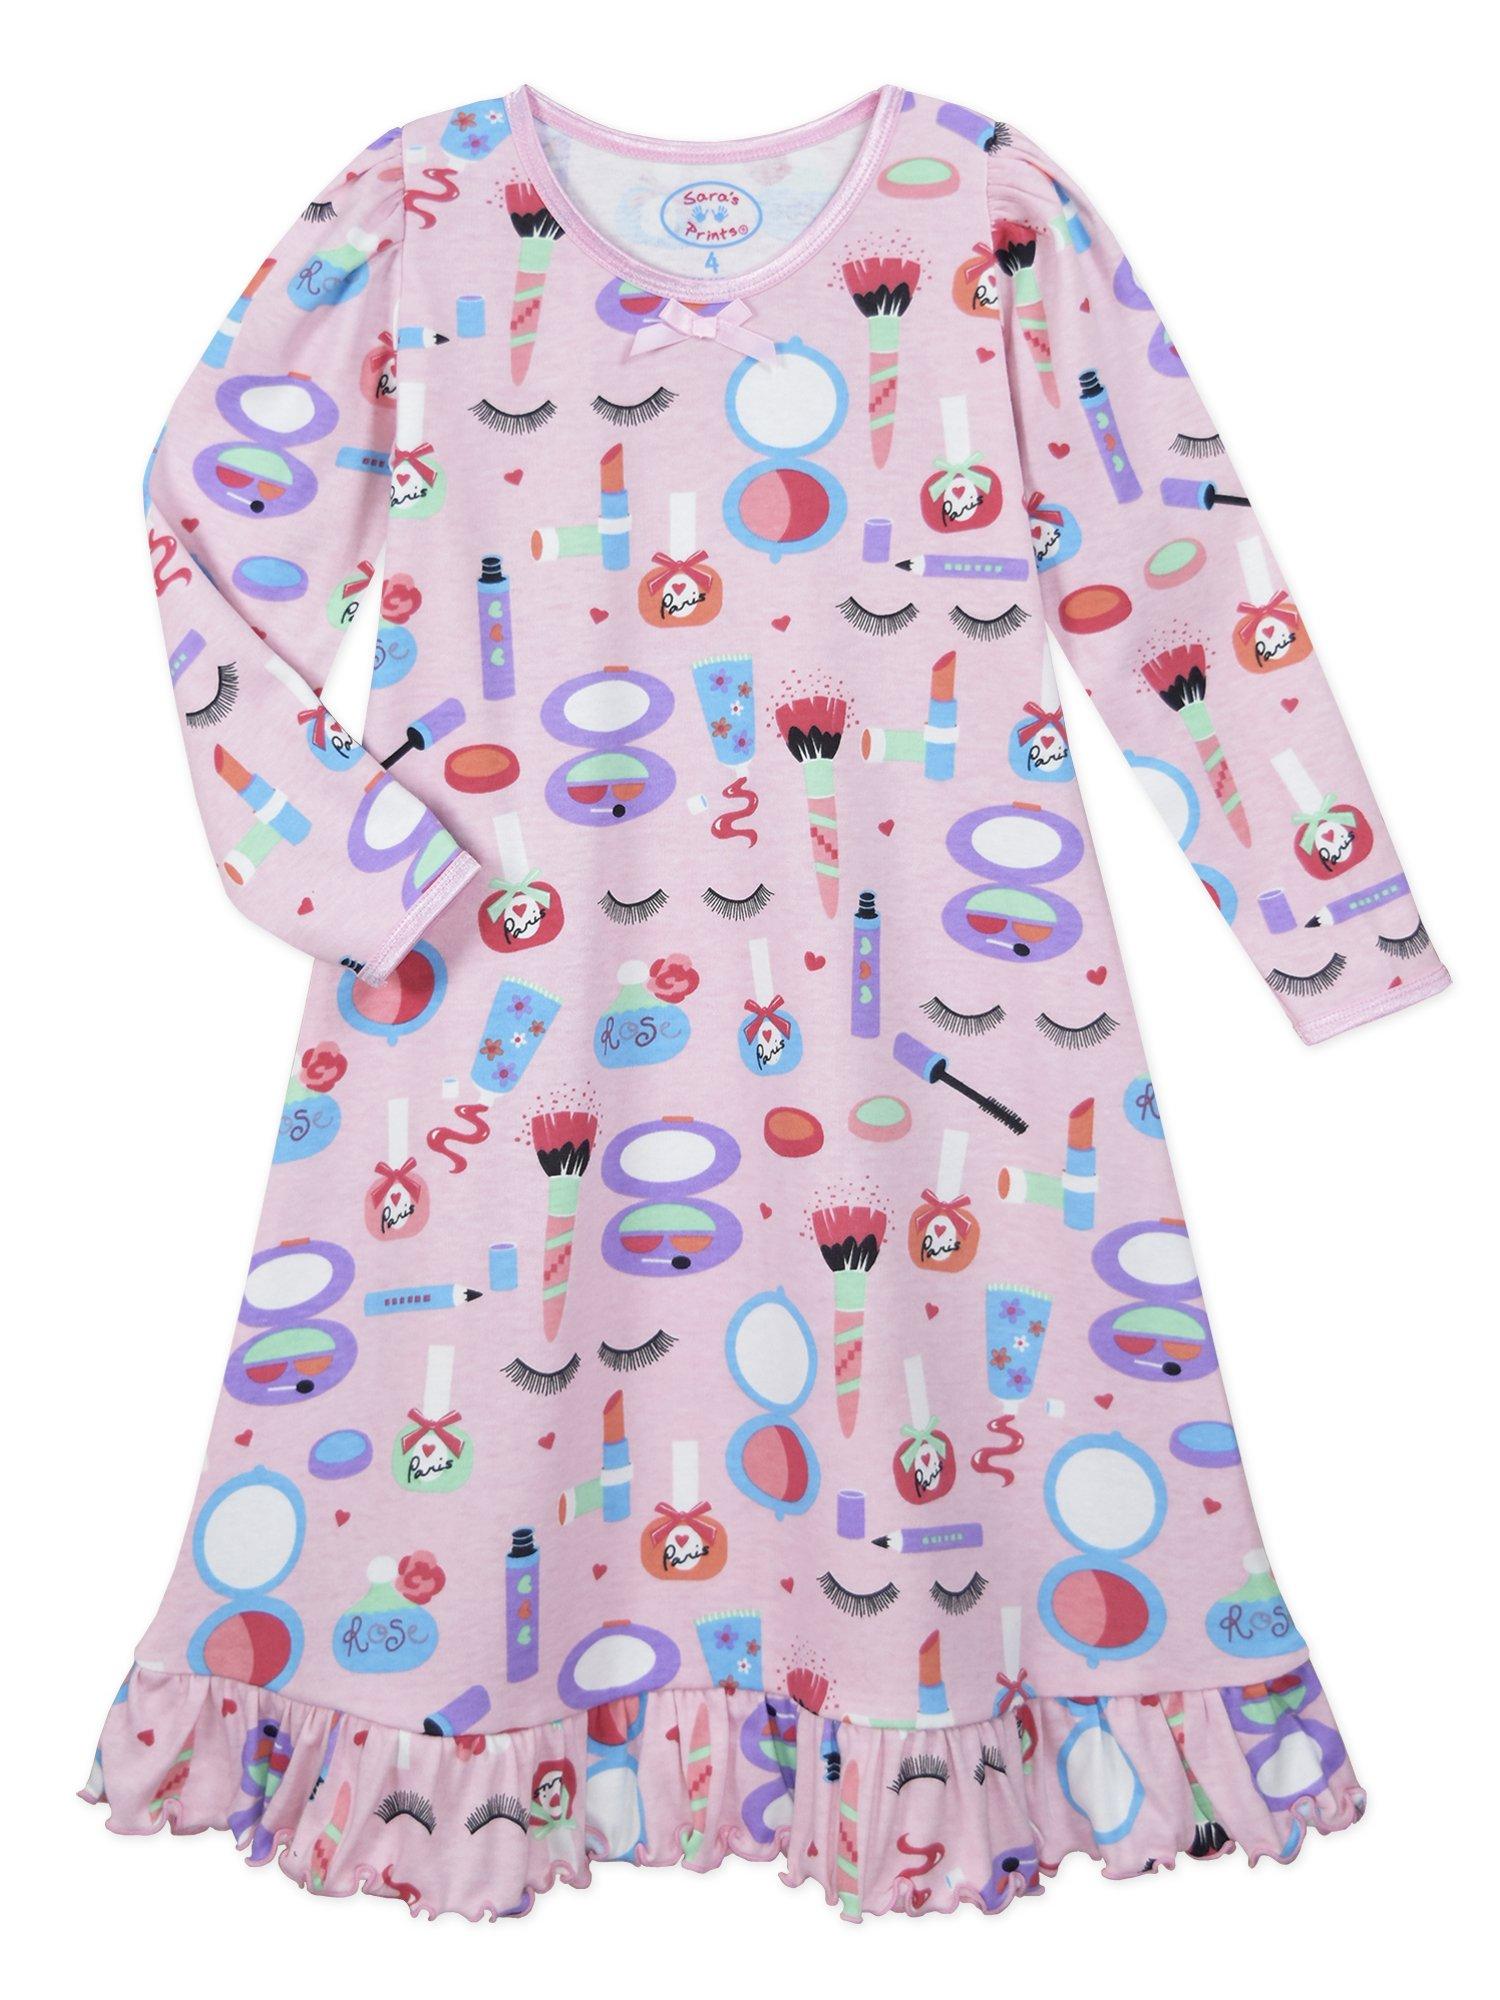 fe0c1cb091 Galleon - Sara s Prints Big Girls  Whirl And Twirl Long Sleeve Nightgown